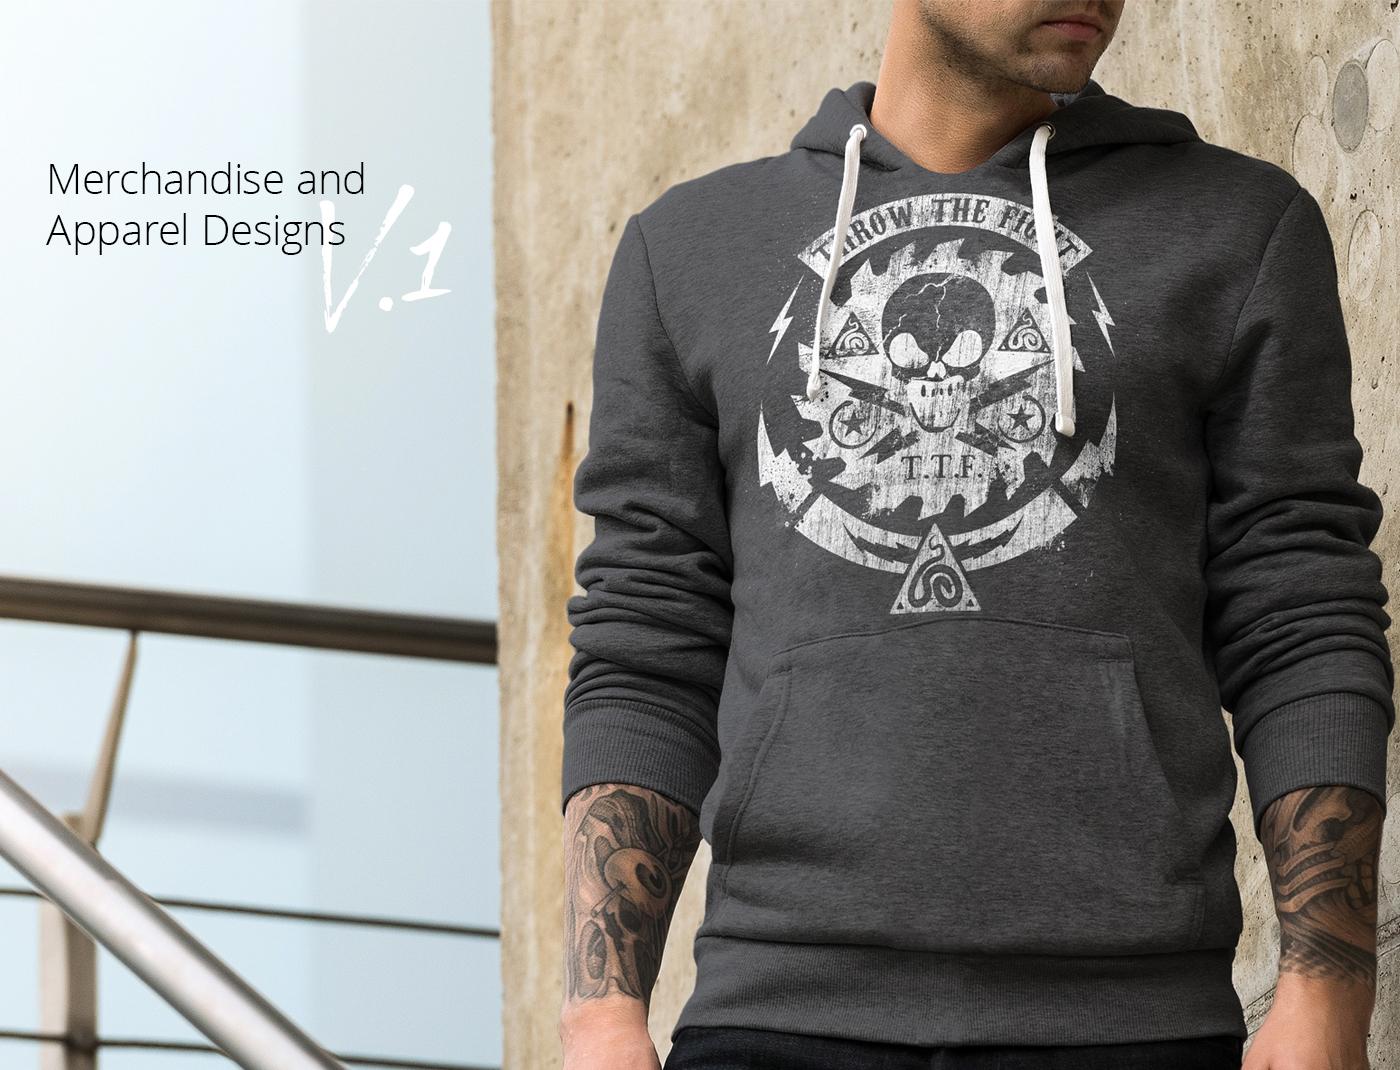 Merchandise & Apparel designs